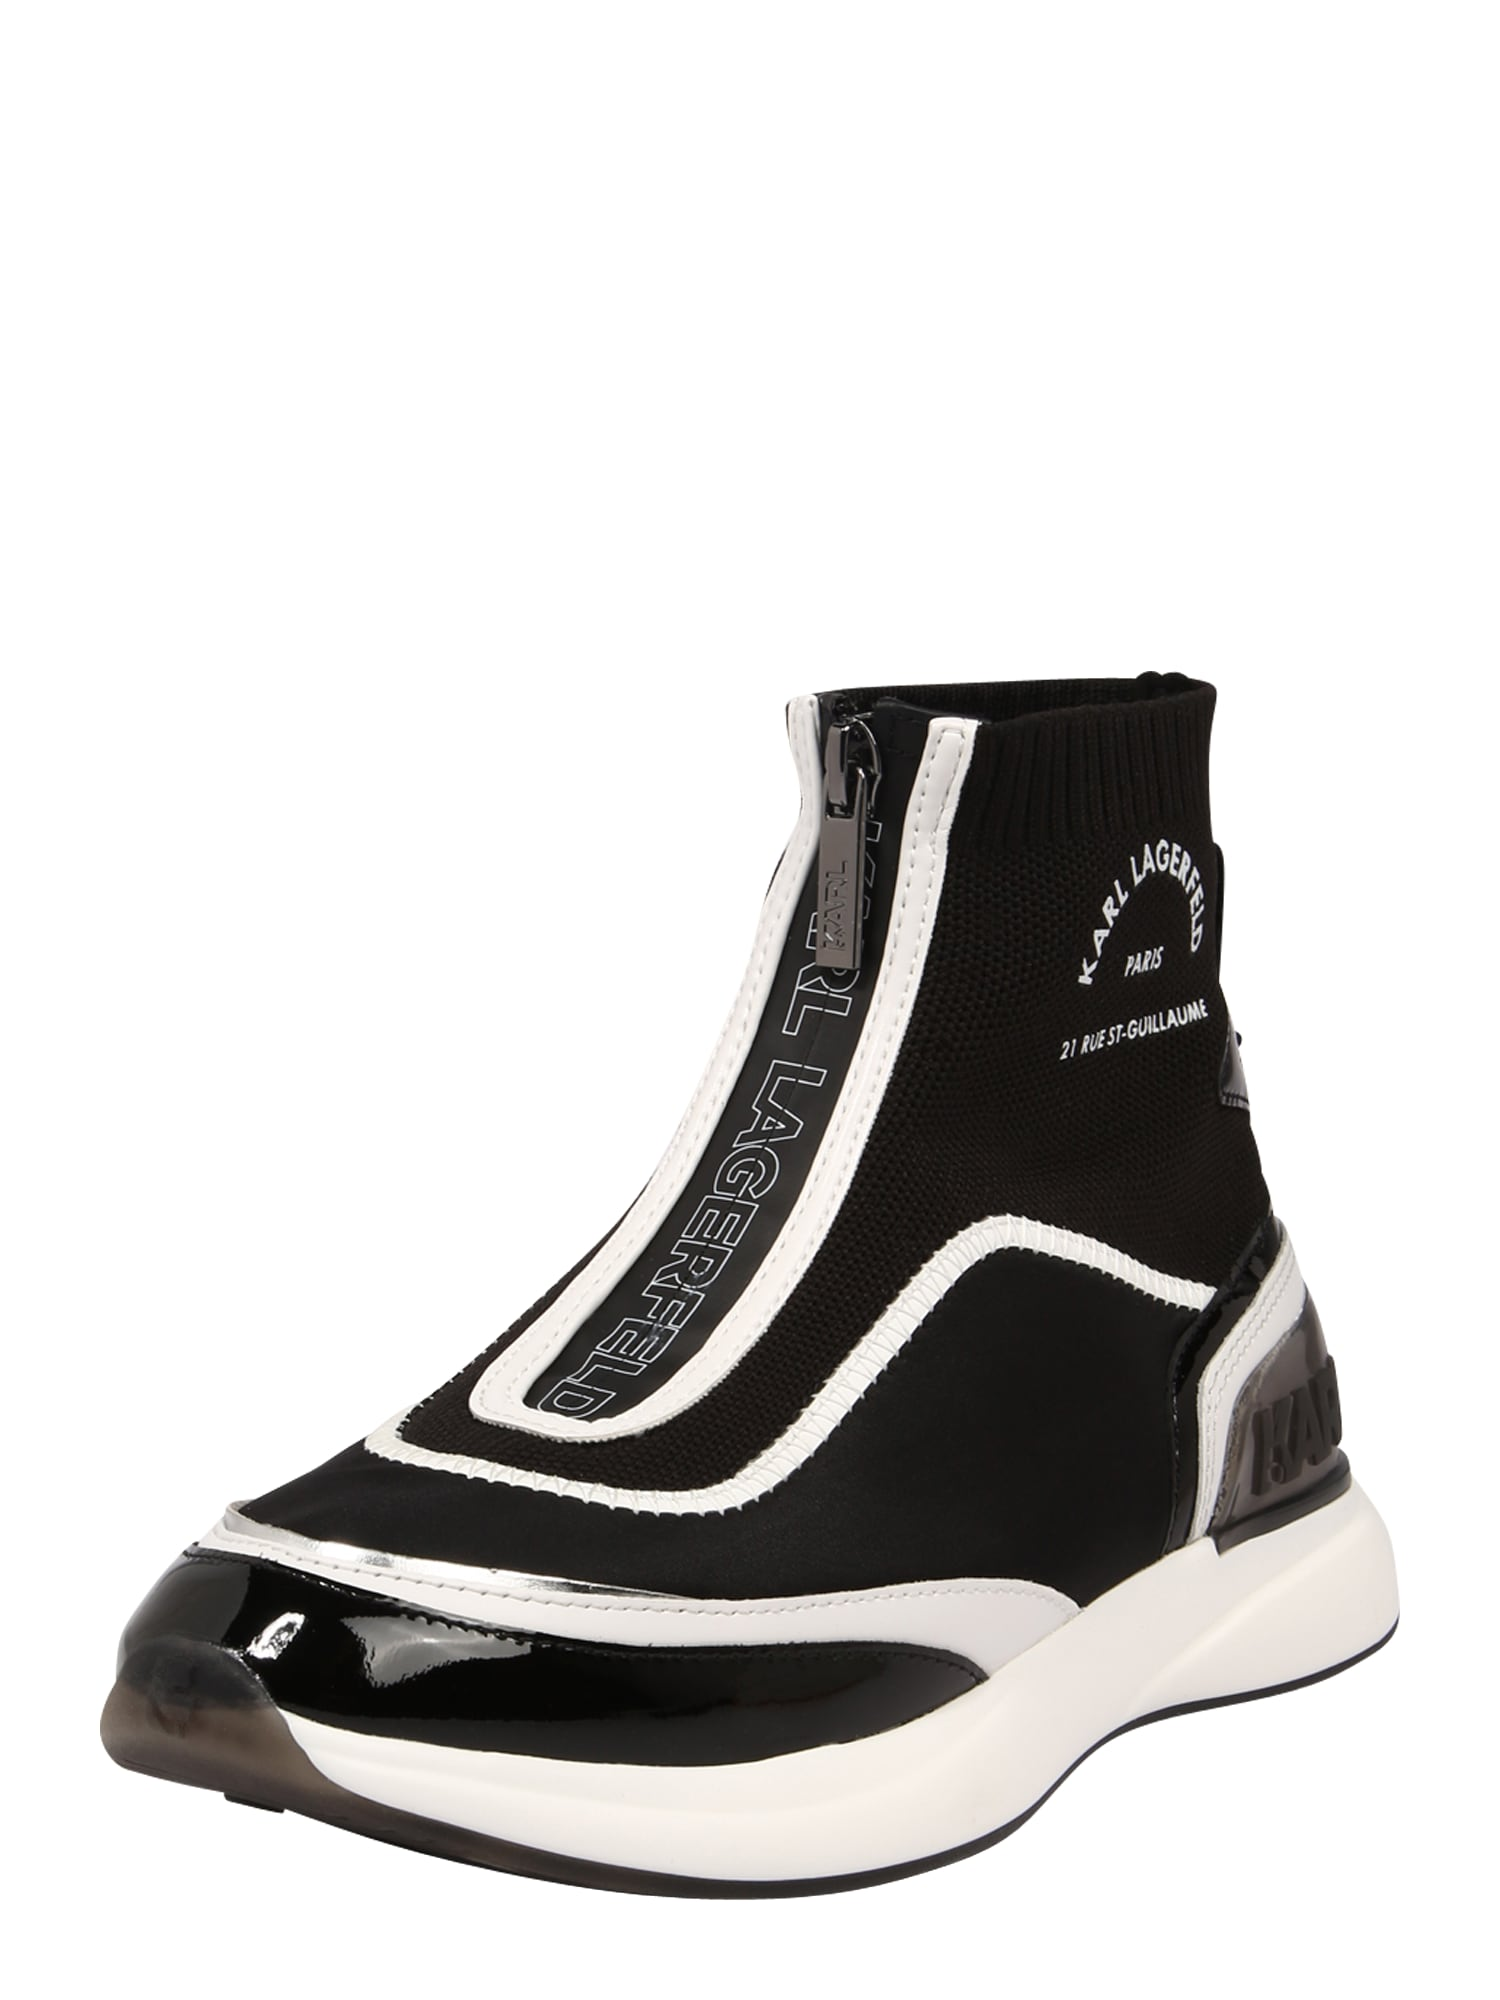 Karl Lagerfeld Aulinukai